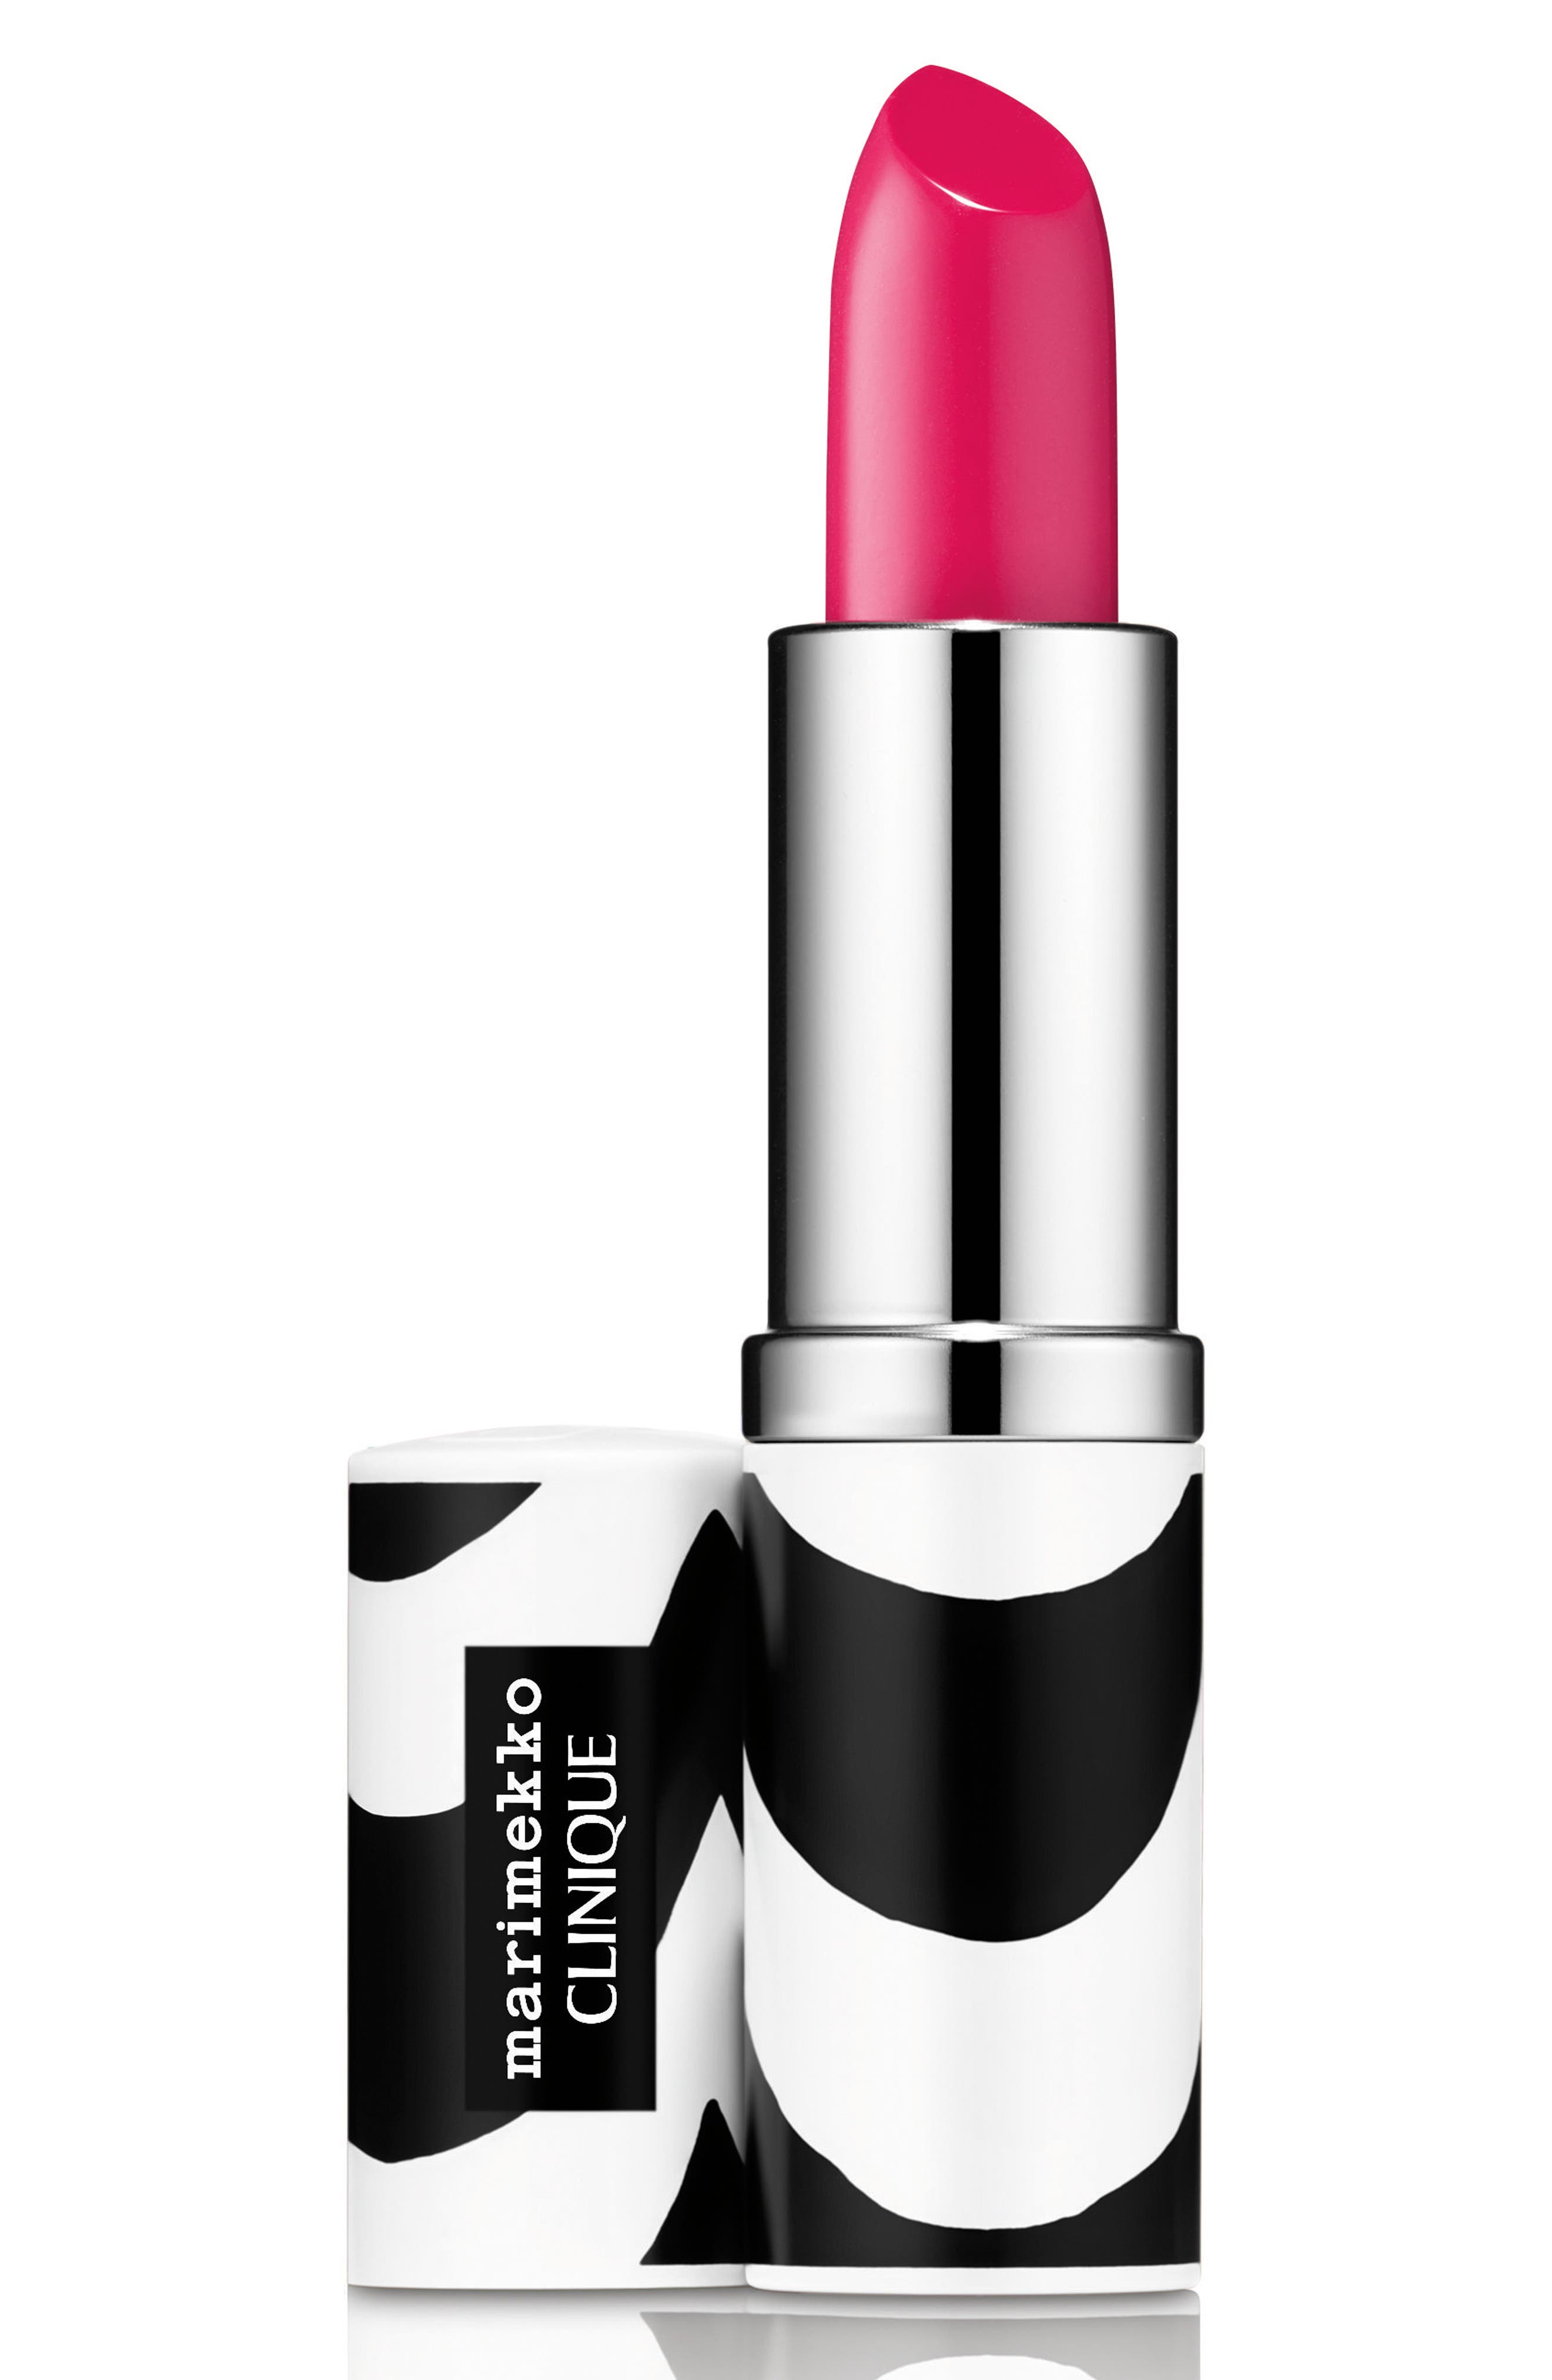 Marimekko Pop Lipstick,                             Main thumbnail 1, color,                             200